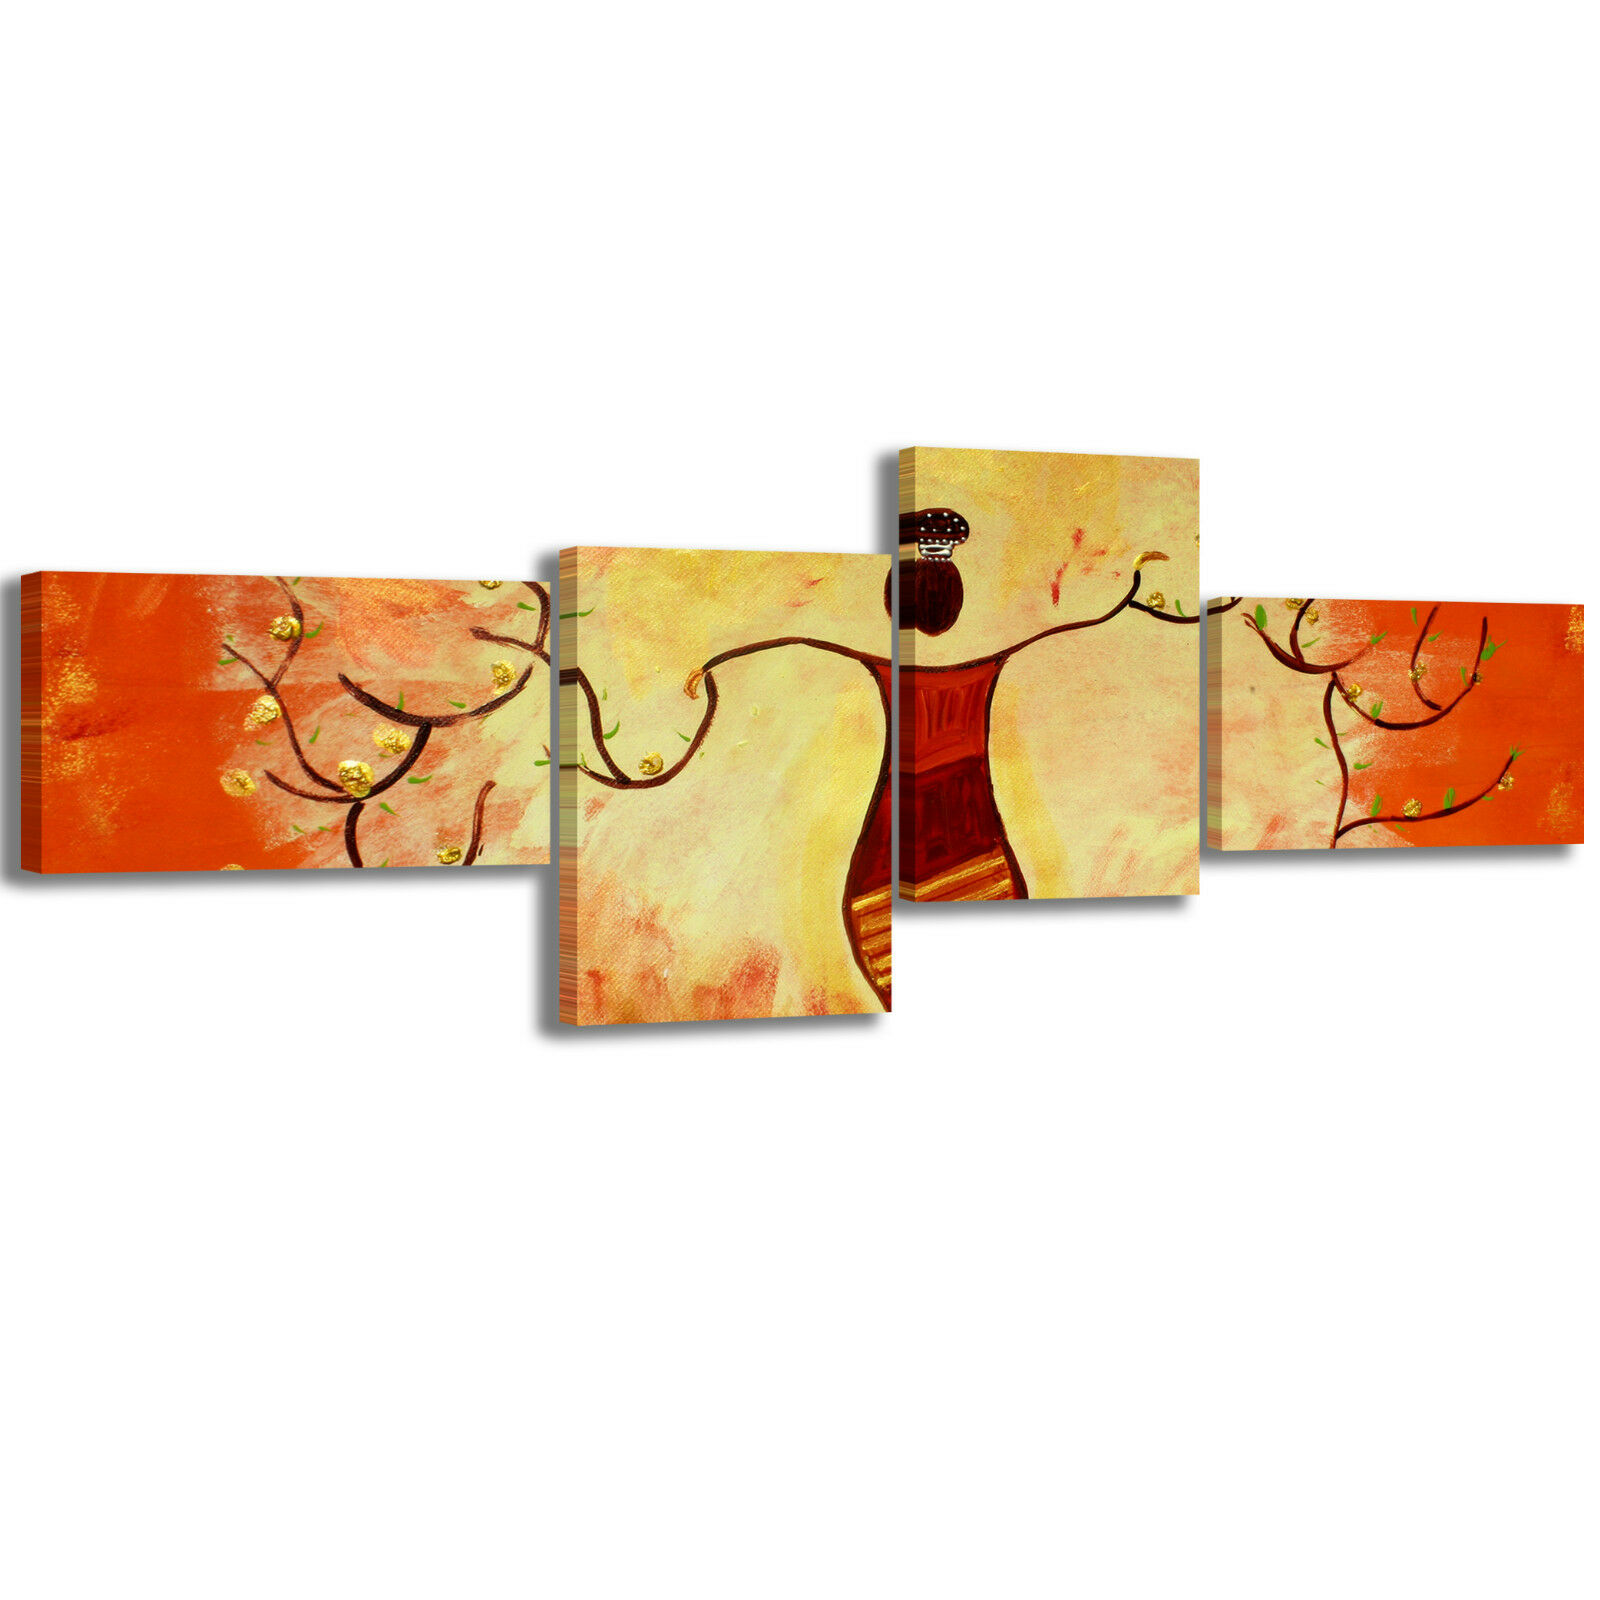 Quadro moderno stampa su tela arRouge aHommes to arRouge arRouge to o arte casa modern art XXL cod106 41a130